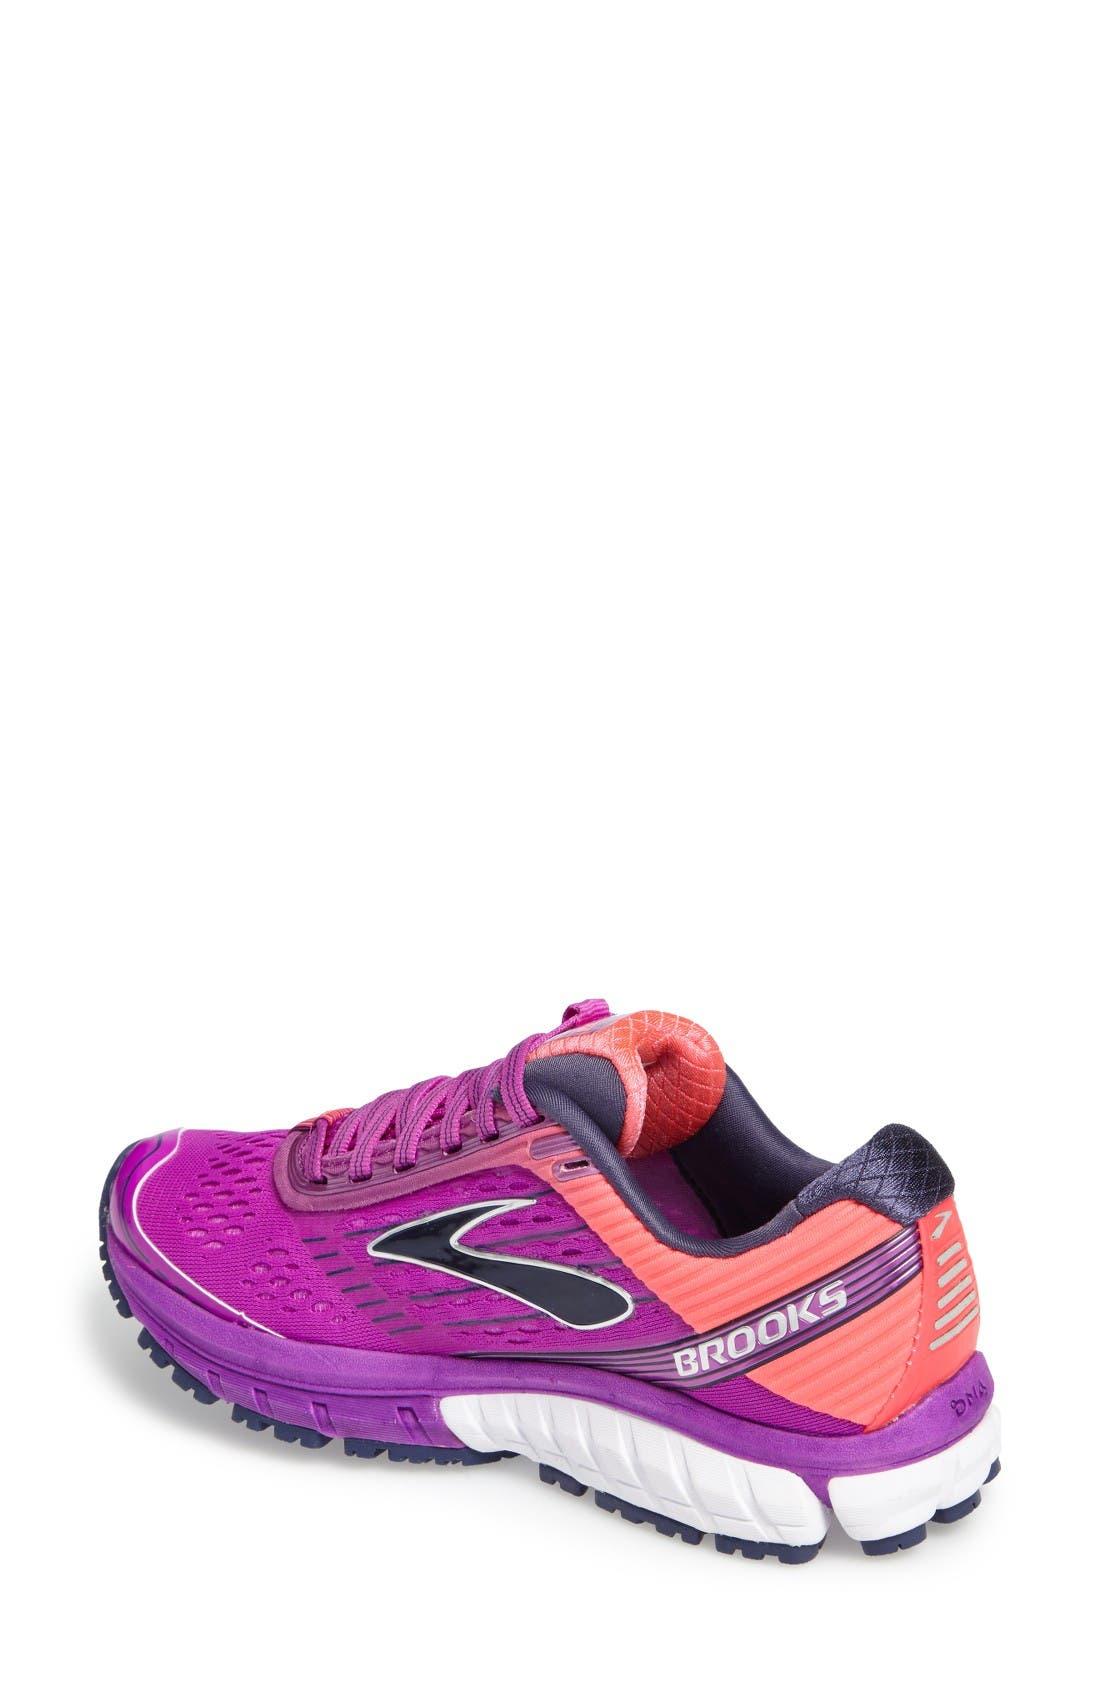 Alternate Image 2  - Brooks 'Ghost 9' Running Shoe (Women)